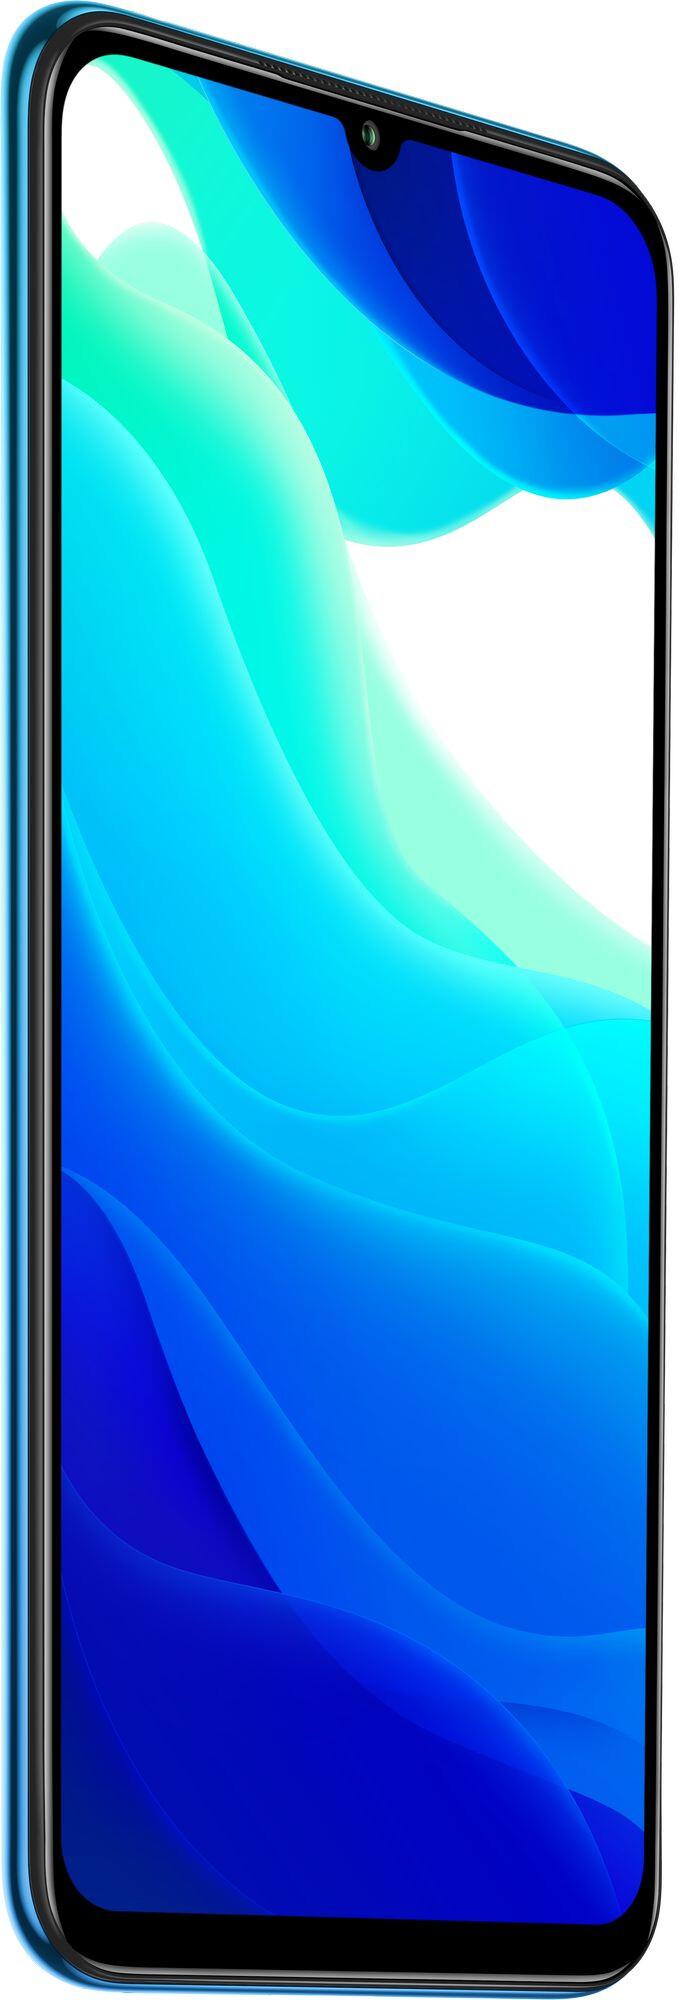 Mi 10 Lite okostelefon 6+128GB, Auróra kék